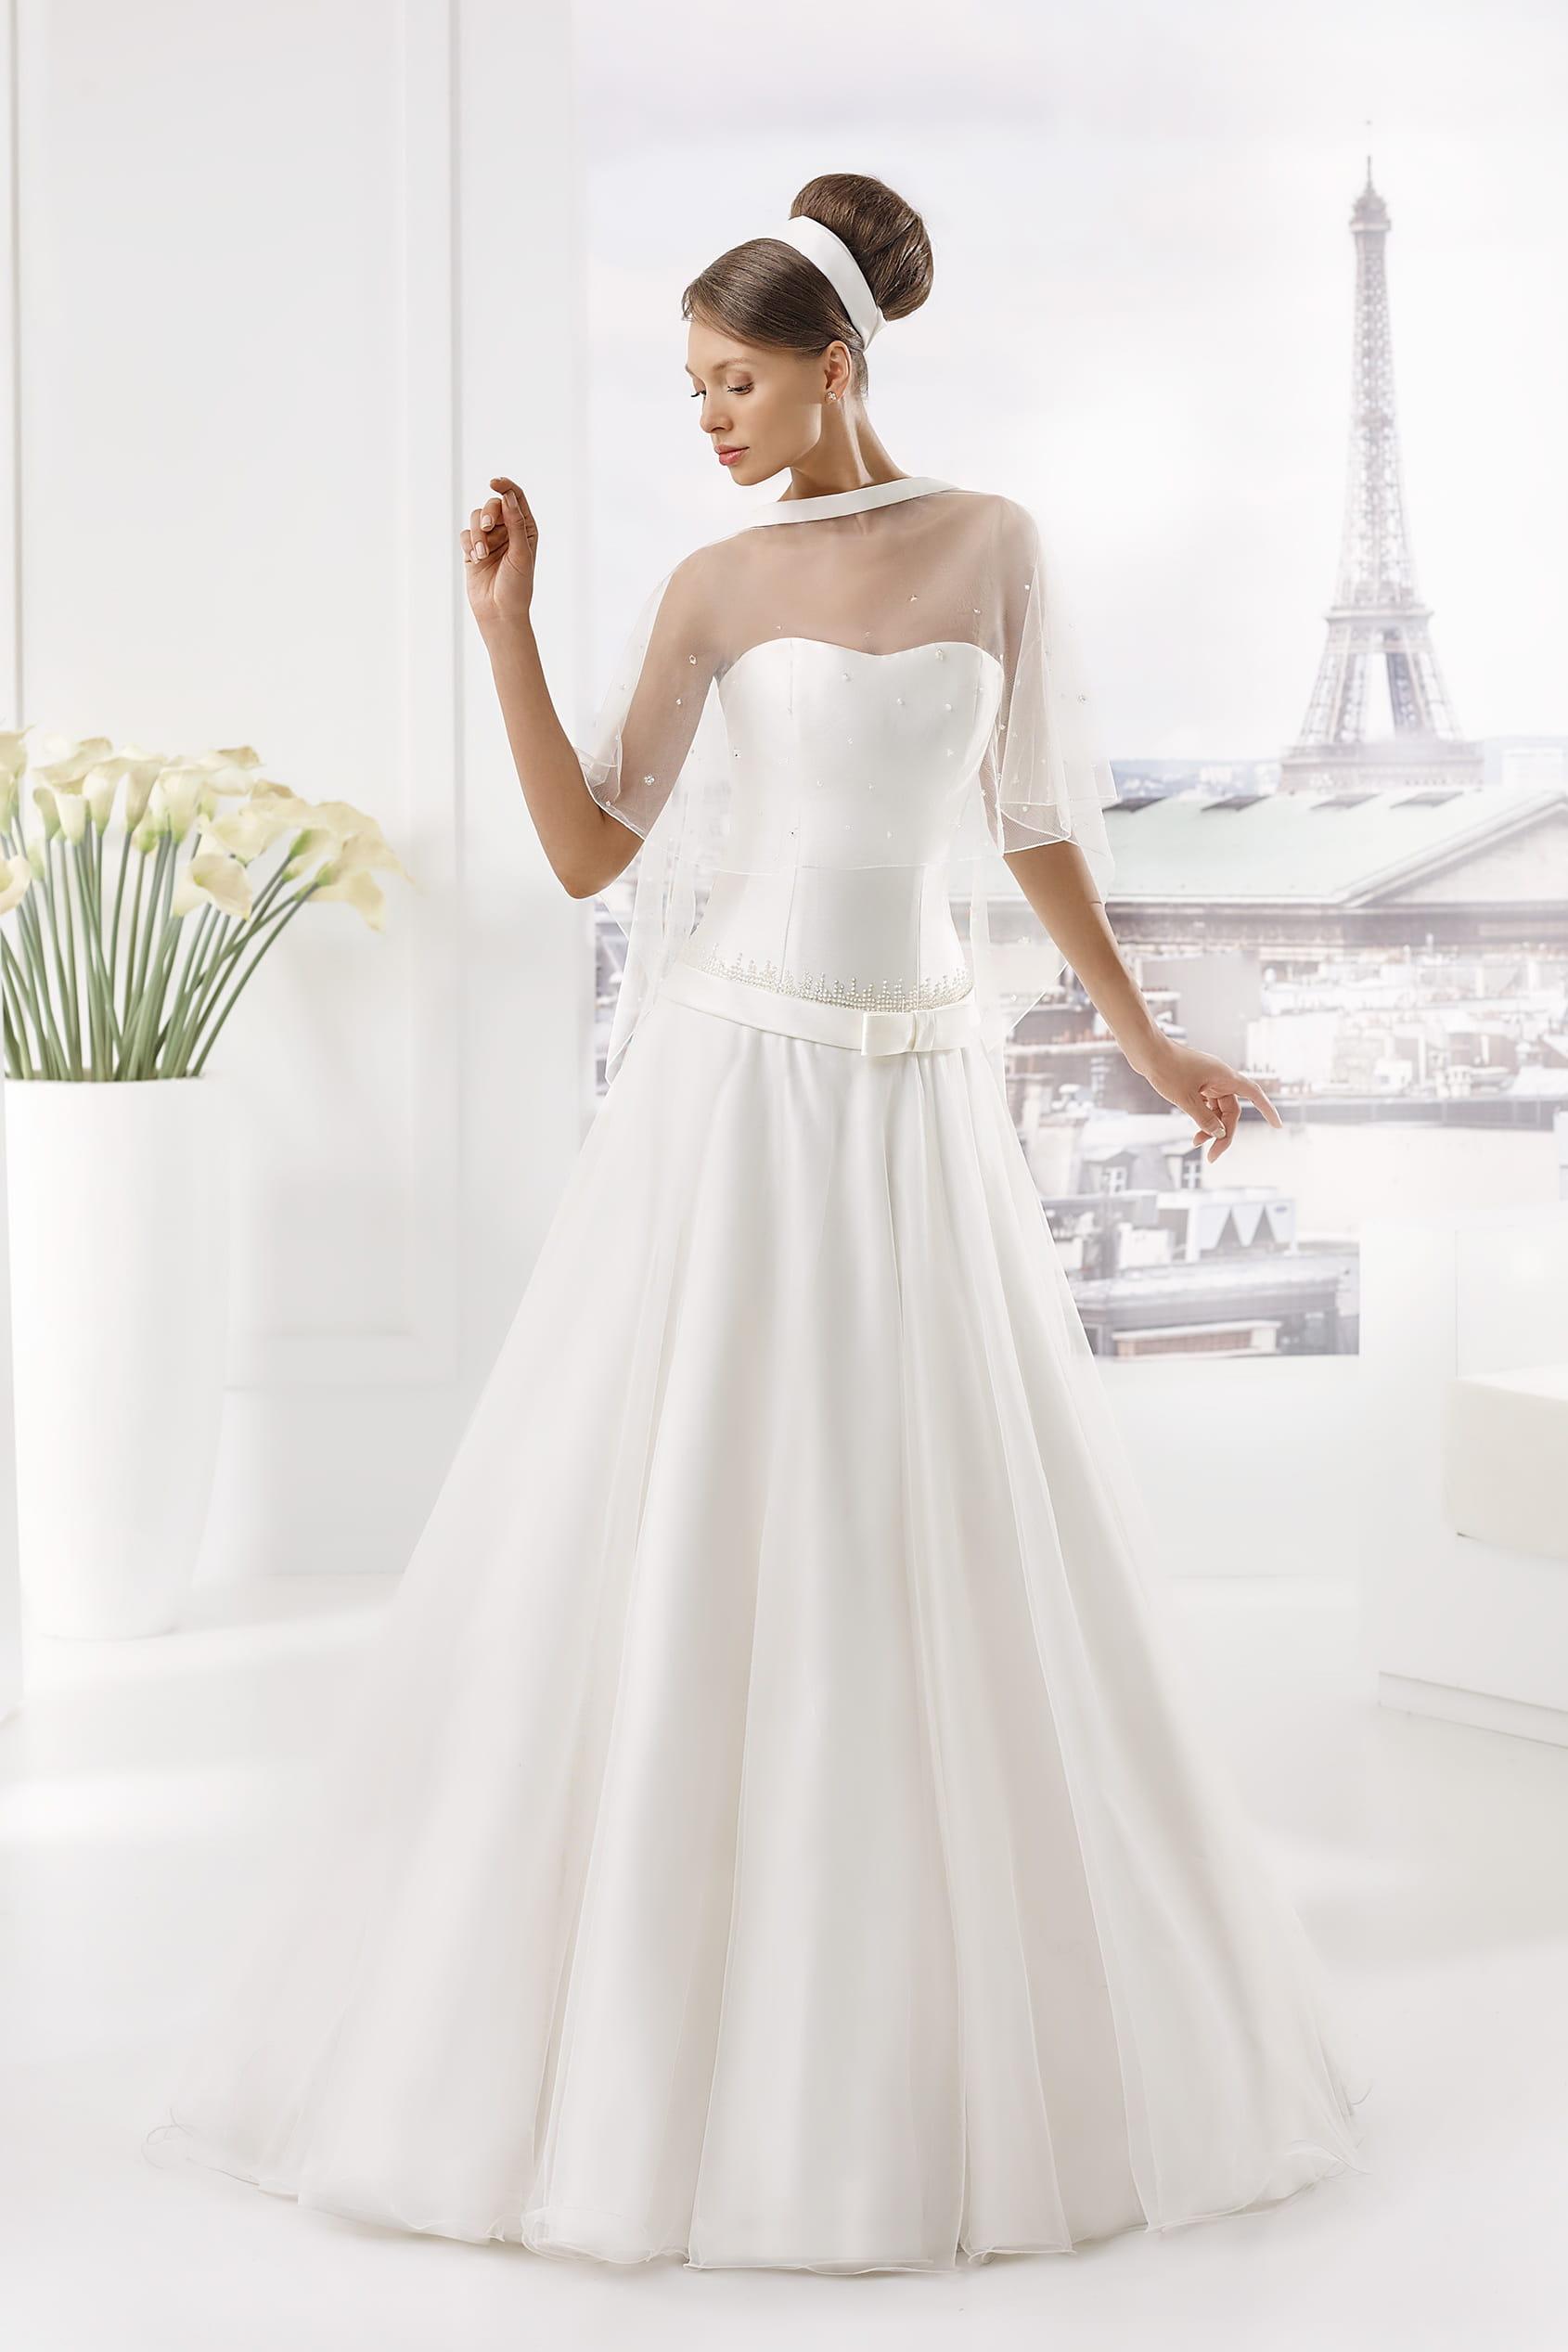 mod le monnin pronuptia les plus belles robes de mari e. Black Bedroom Furniture Sets. Home Design Ideas